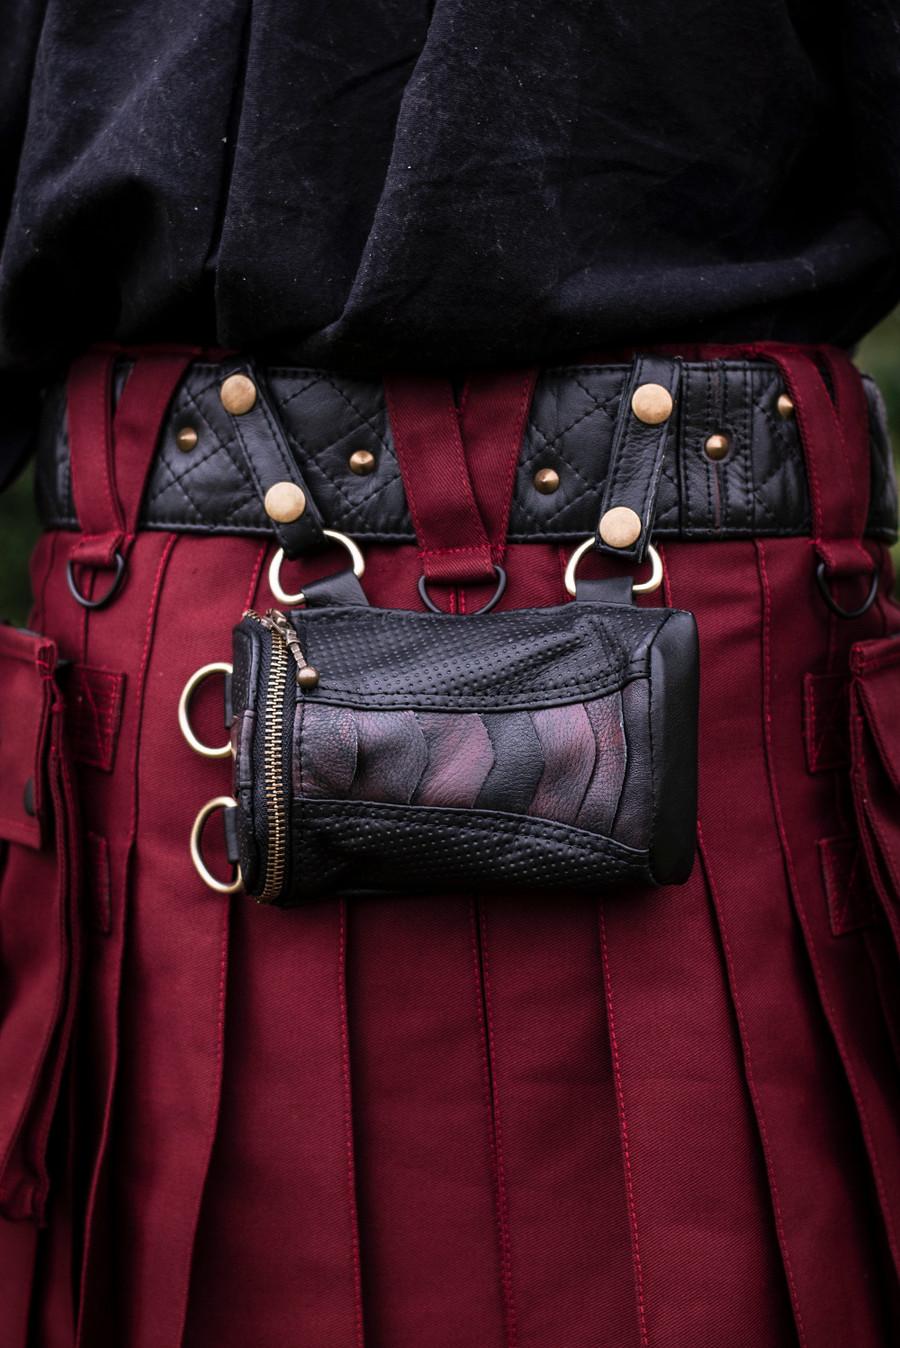 Wallet Pocket with brass details attached to Myrmidon Belt